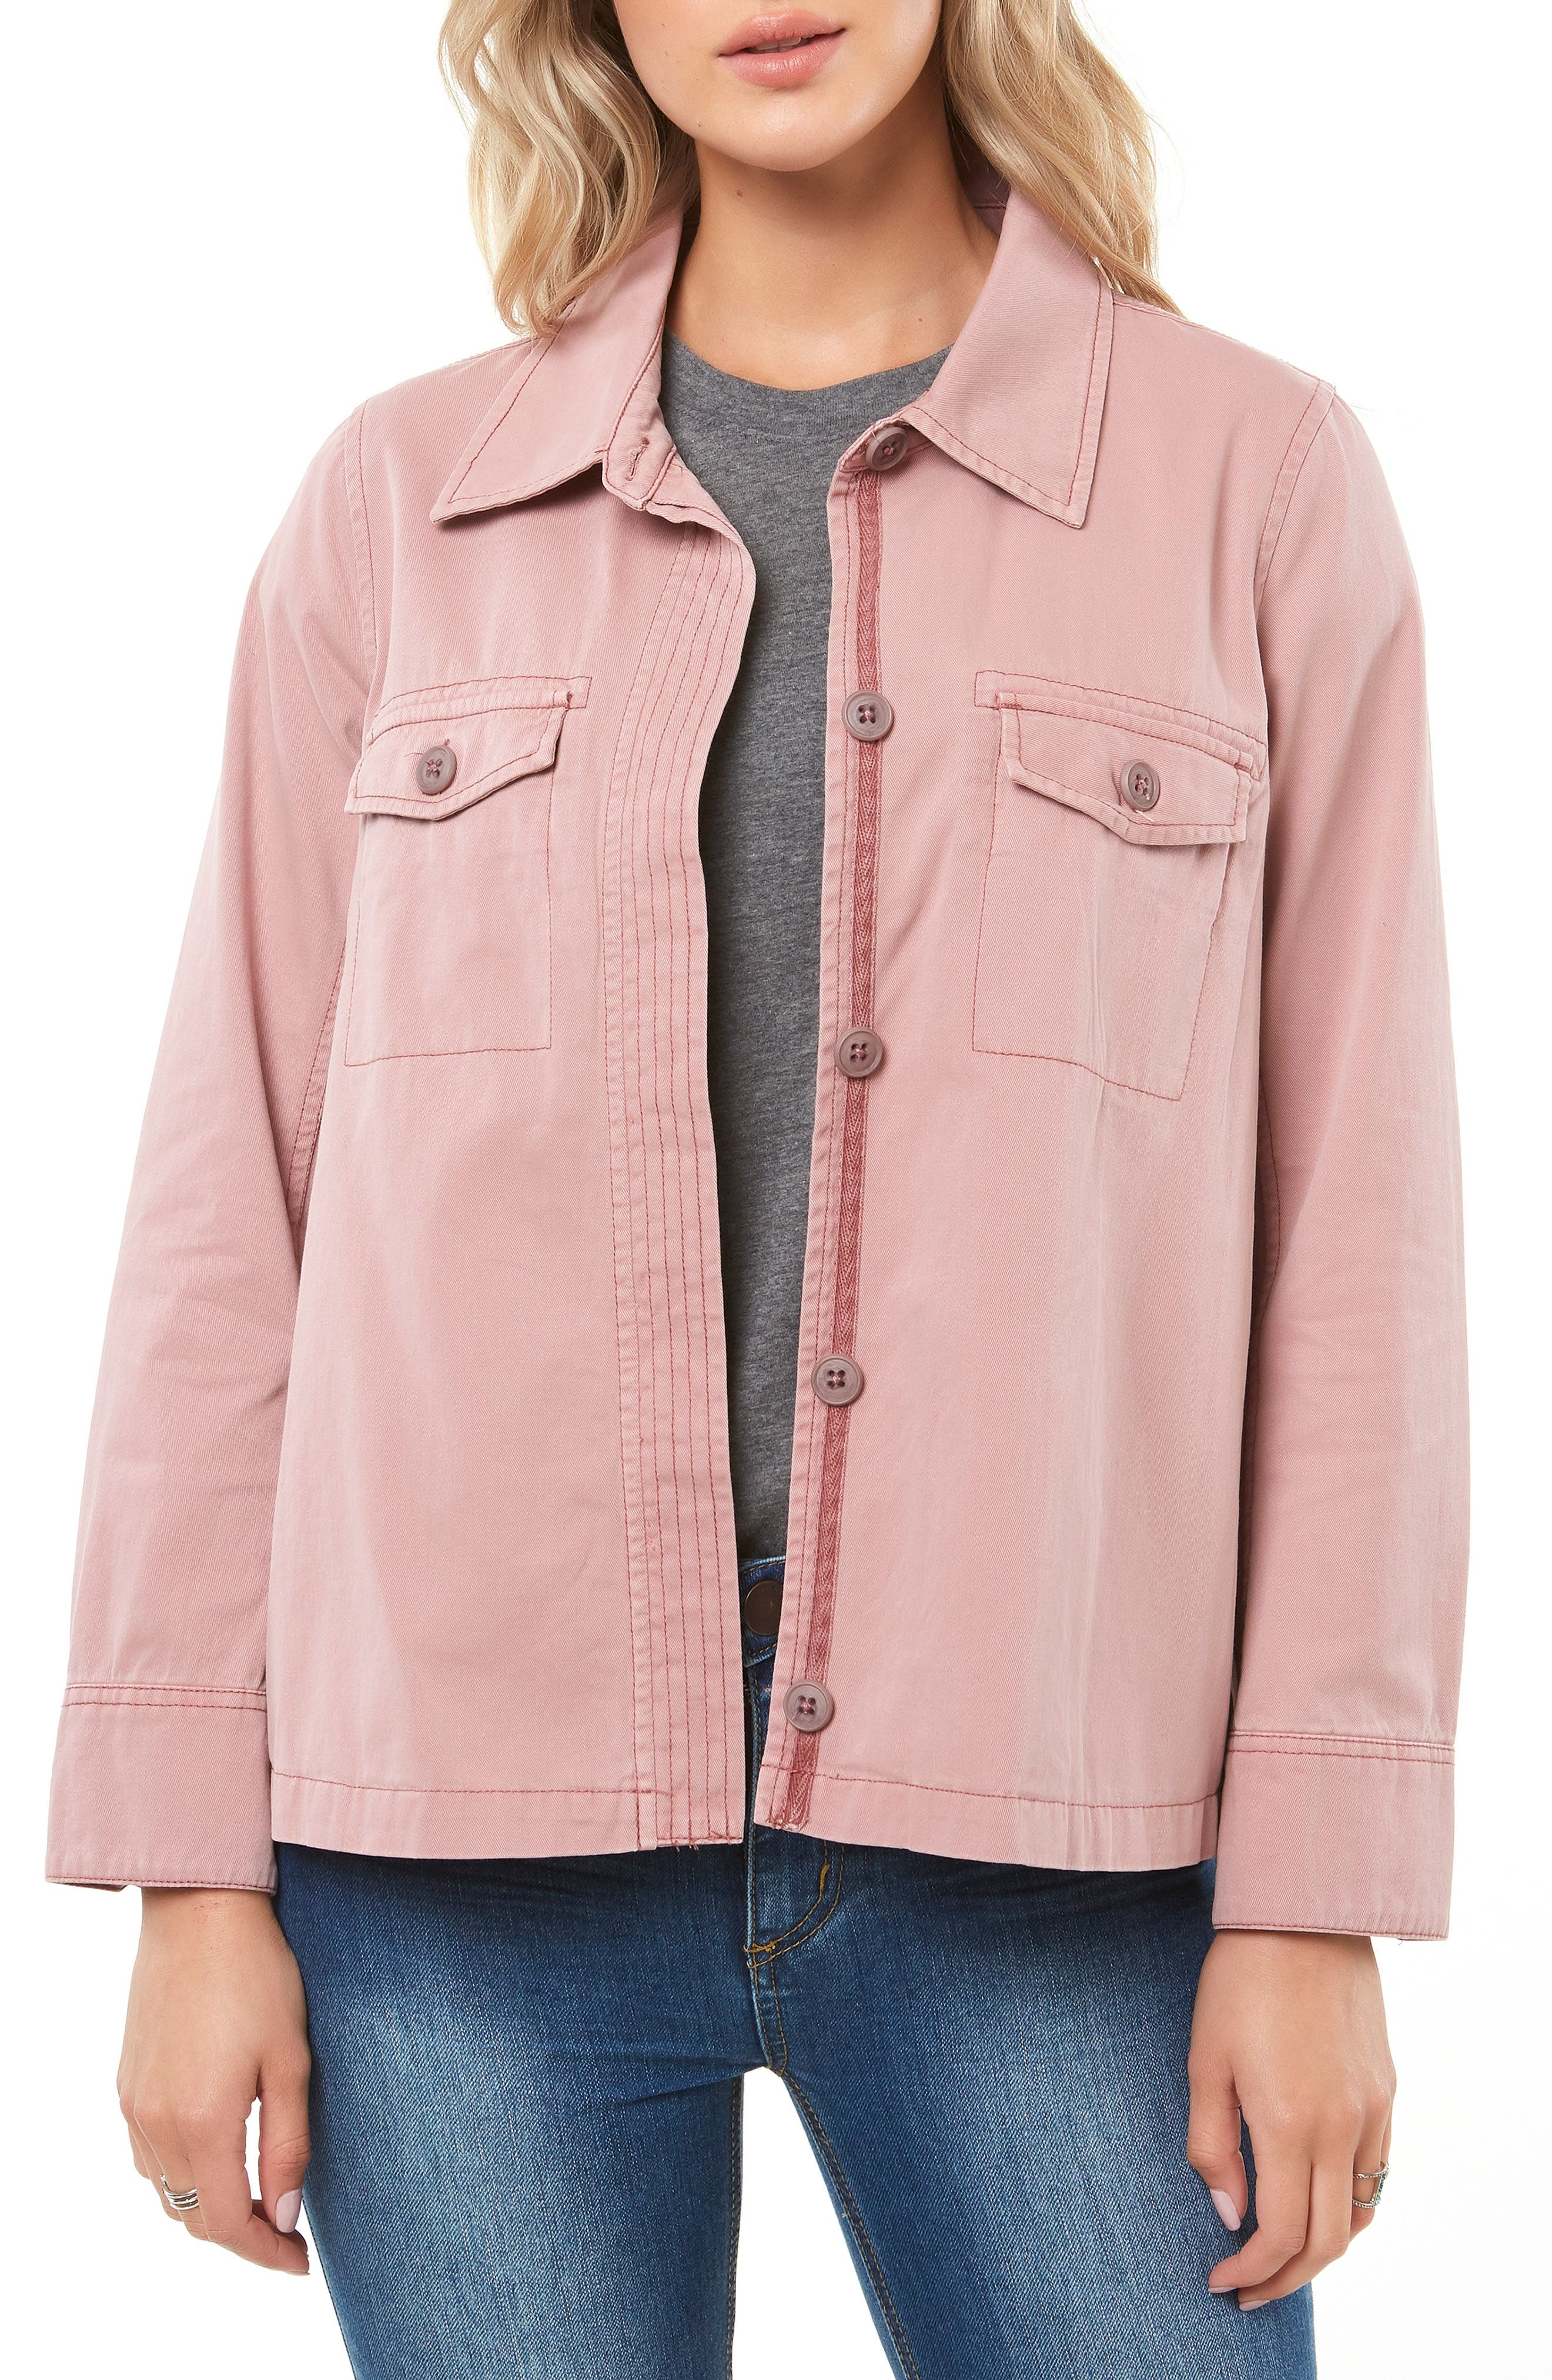 Ripley Twill Shirt Jacket,                         Main,                         color, FAWN